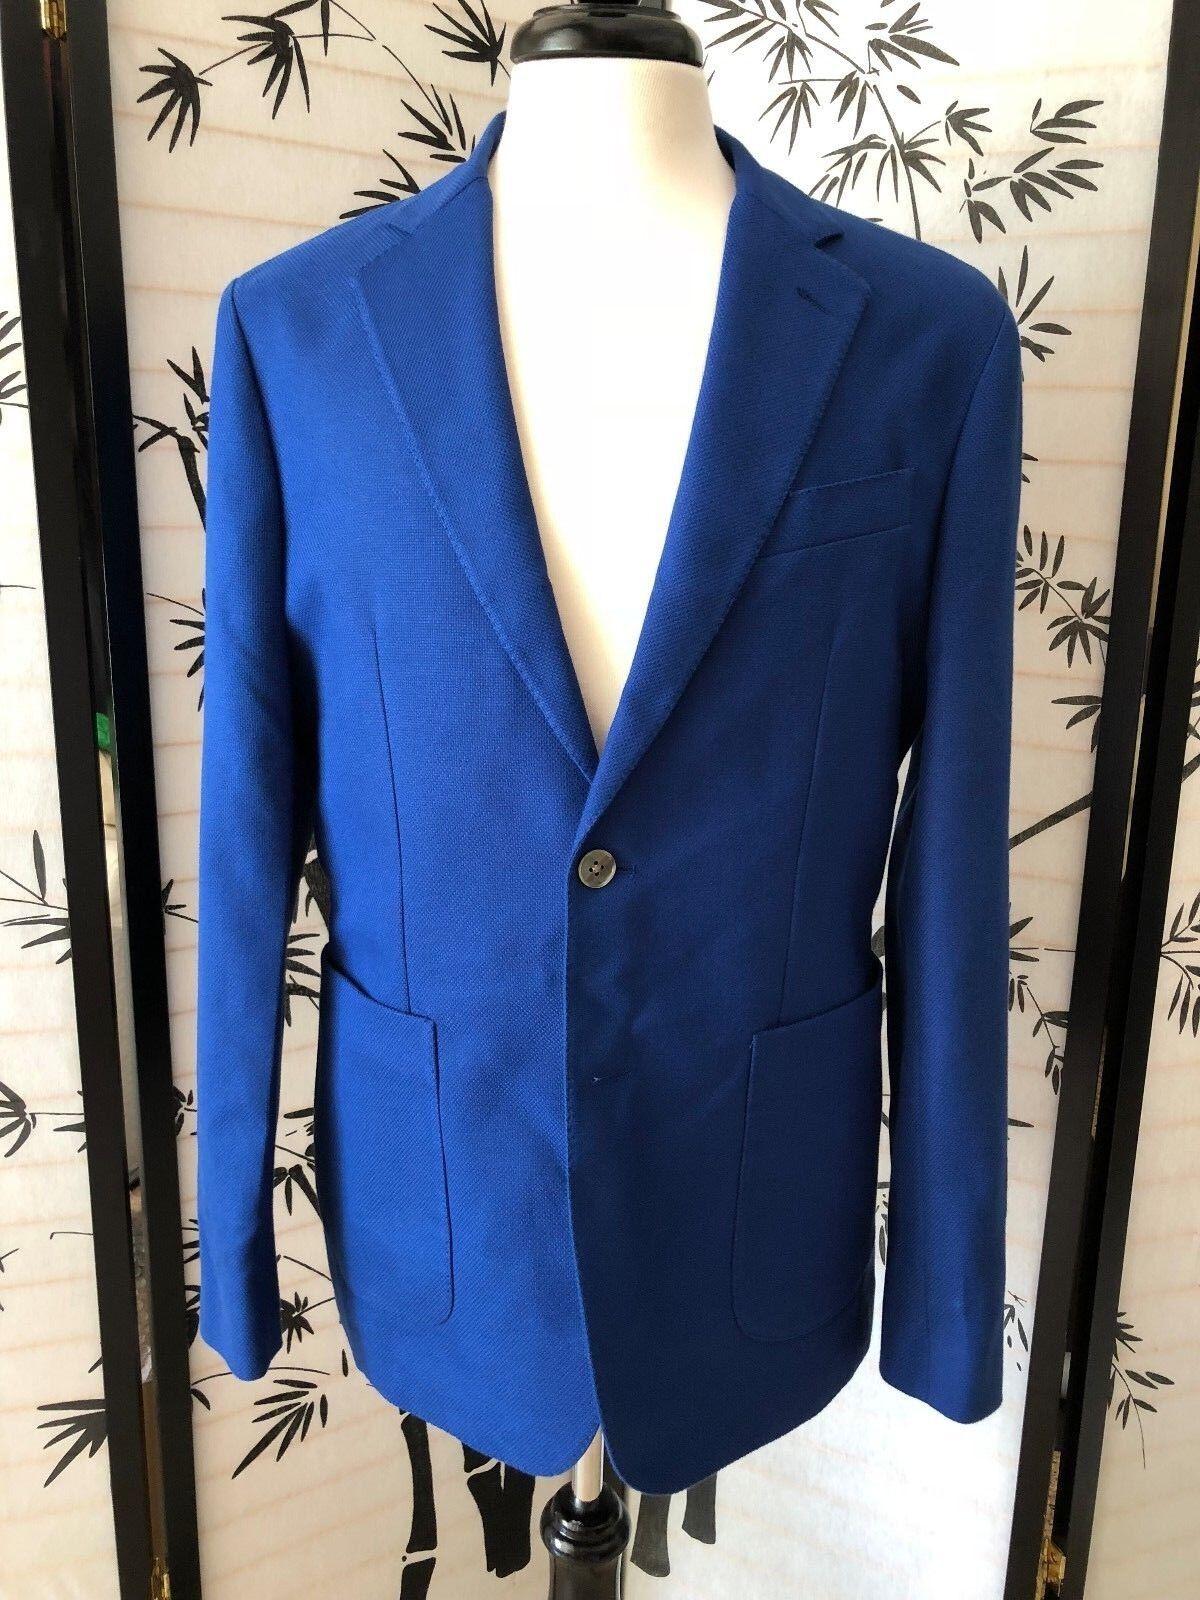 NWT  HARDY AMIES Cotton Wool Blend Blazer Sport Coat Sz 40R Royal bluee